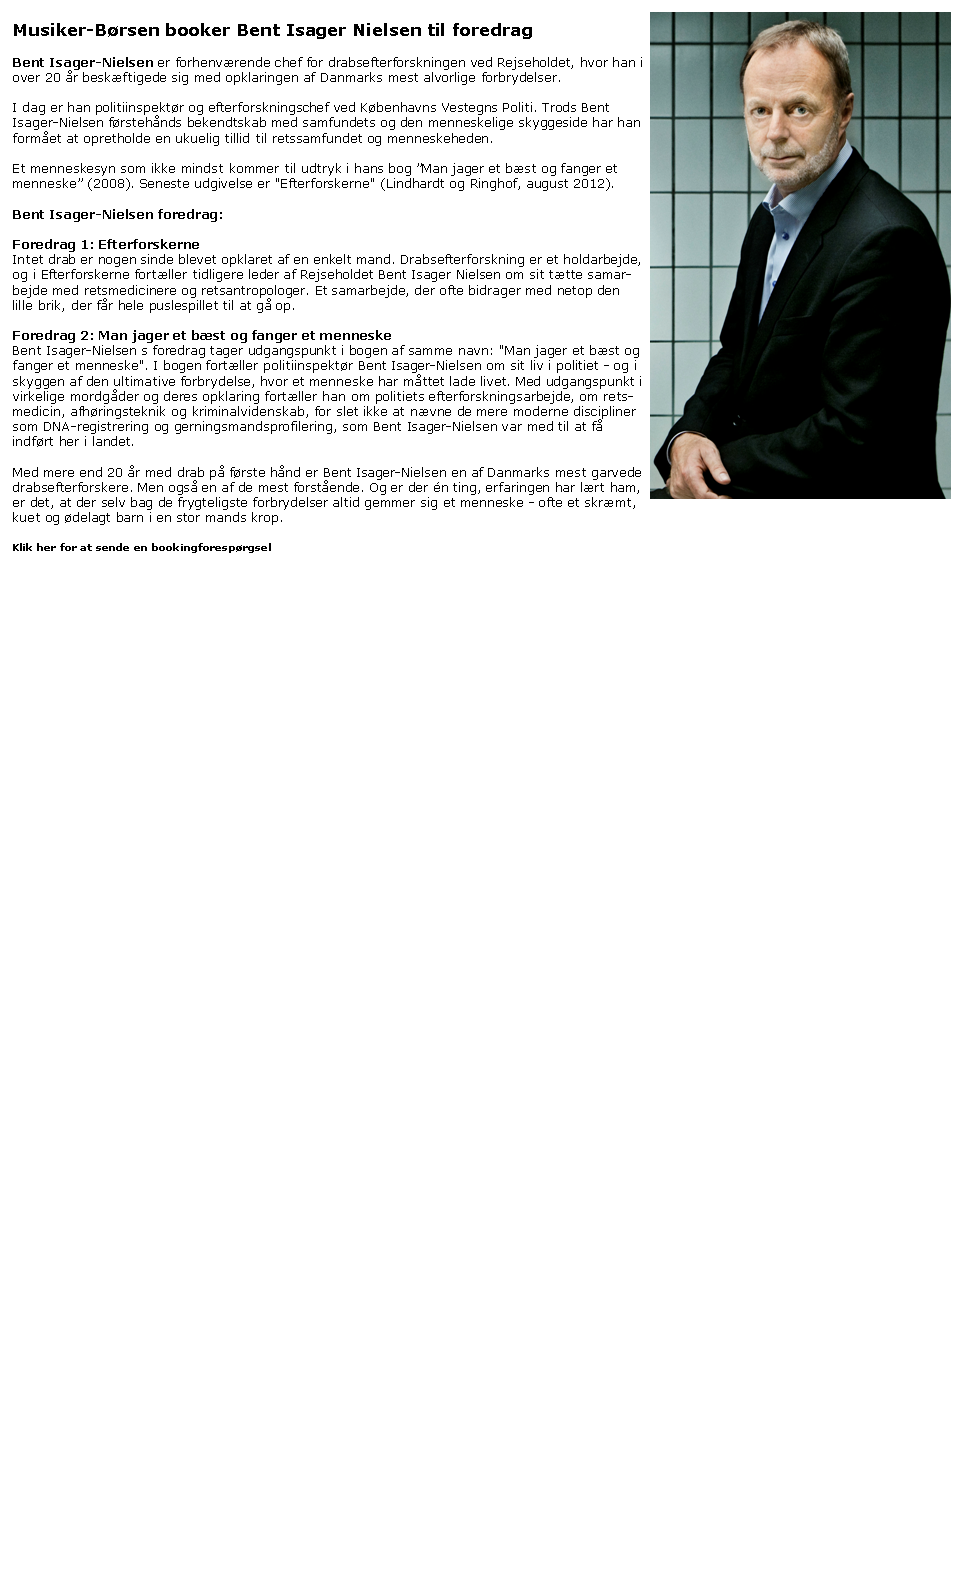 Bent Isager-Nielsen - skyggesideforedragsholder